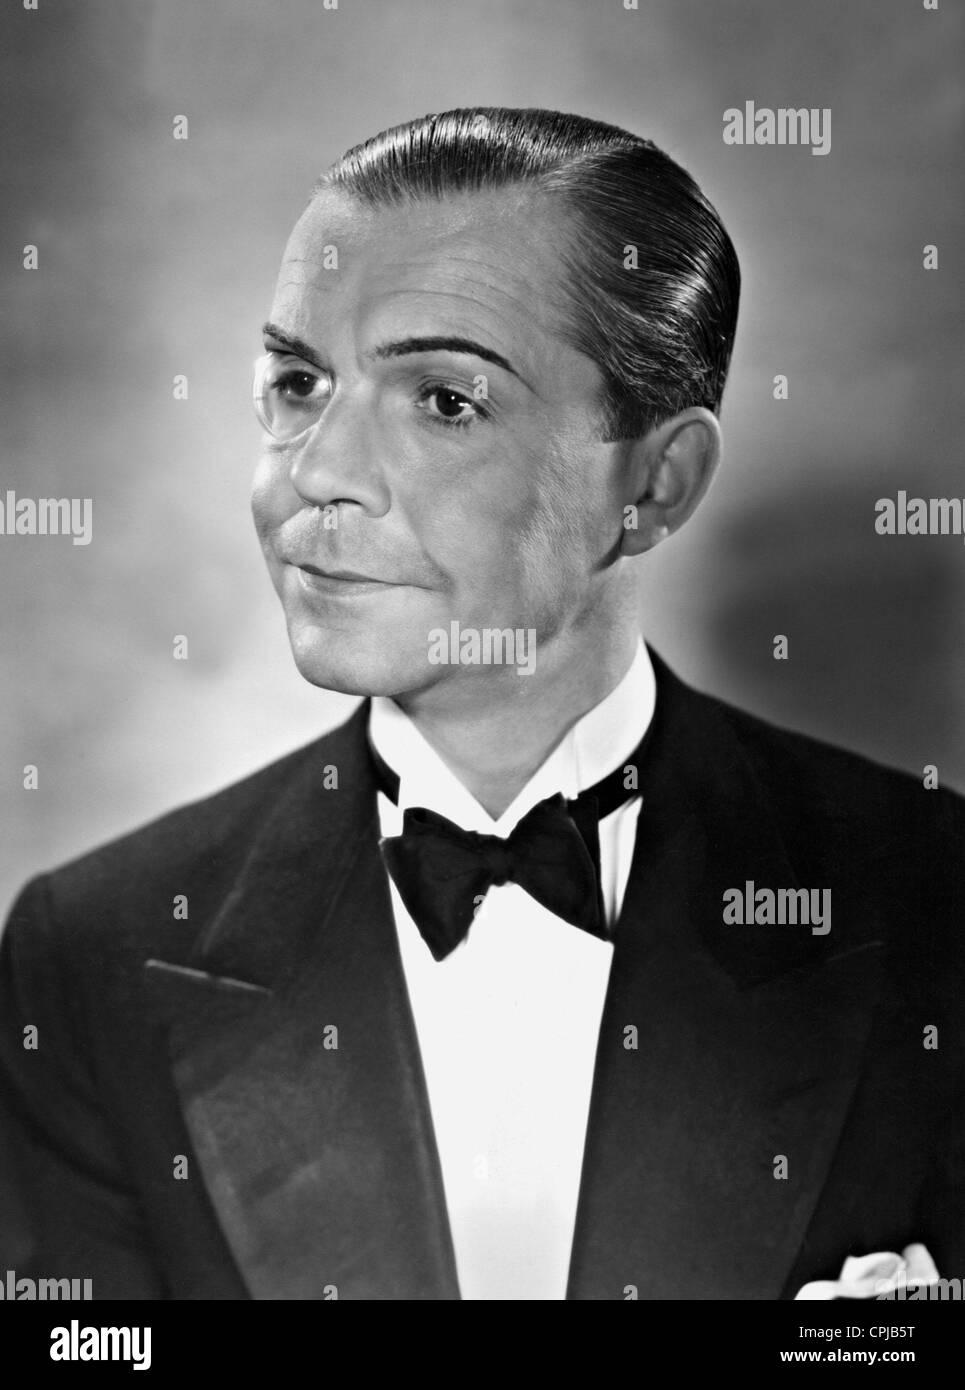 Franz Schafheitlin in 'IA in Oberbayern', 1936 - Stock Image